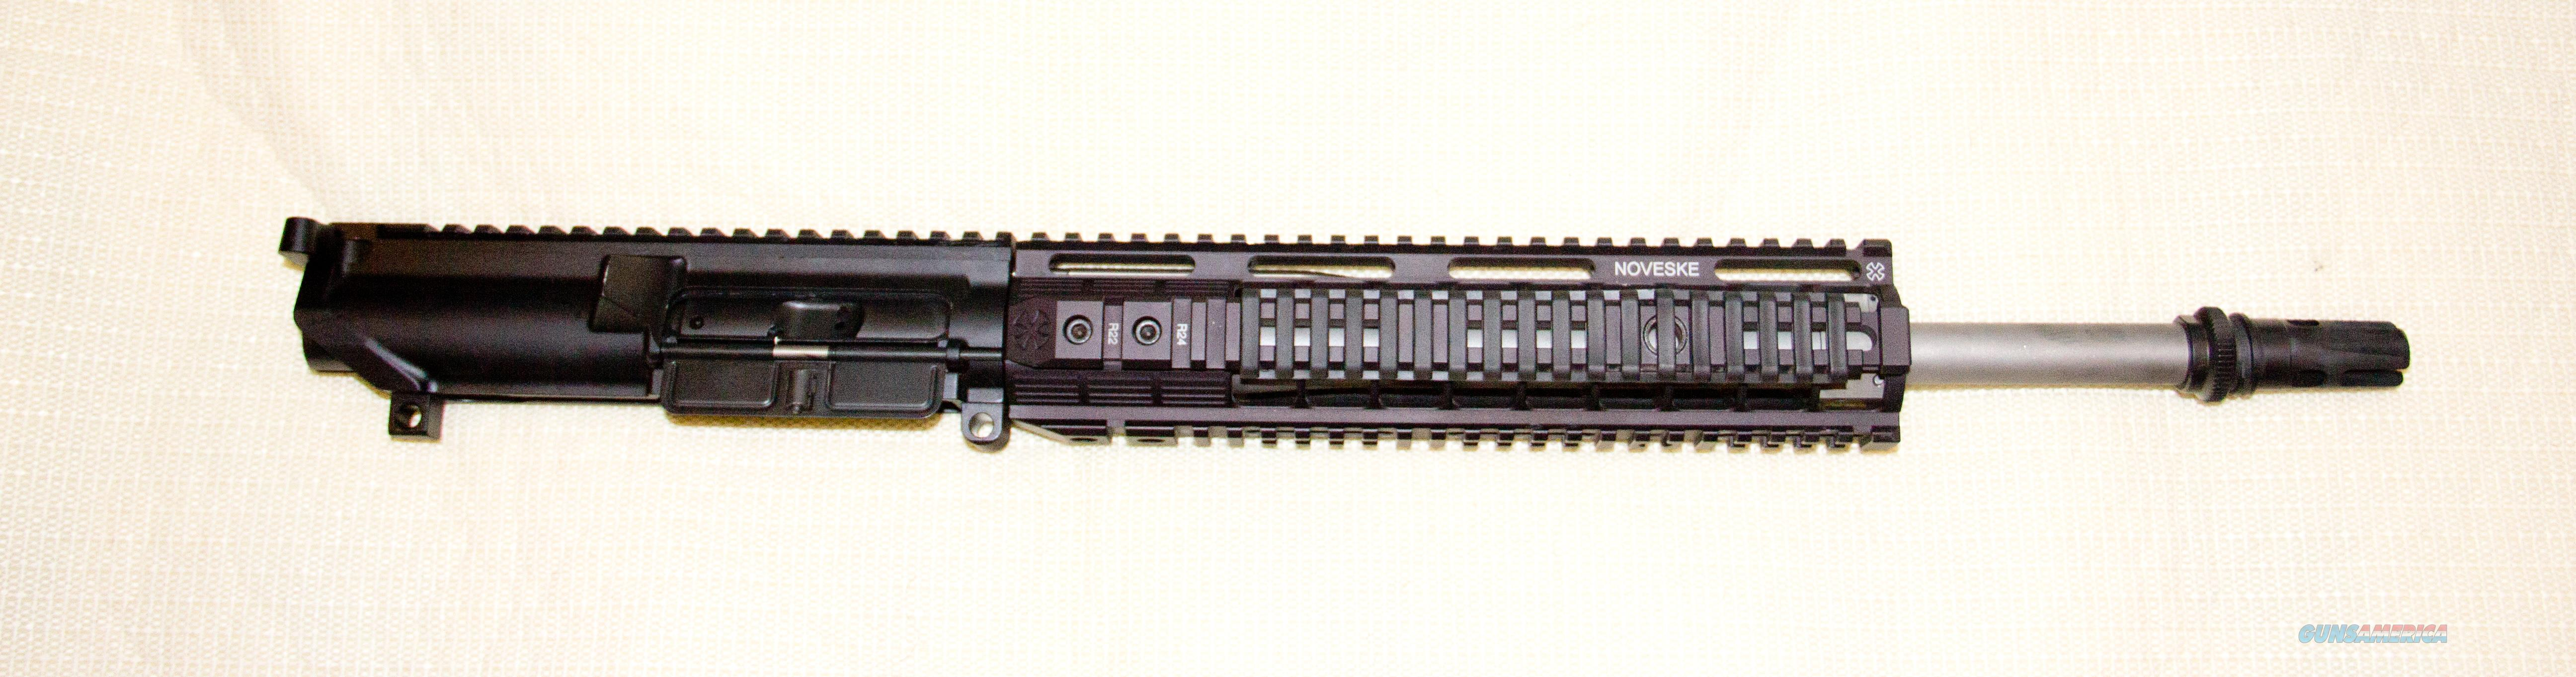 308 / 7.65 Noveske Upper  Guns > Rifles > AR-15 Rifles - Small Manufacturers > Complete Rifle